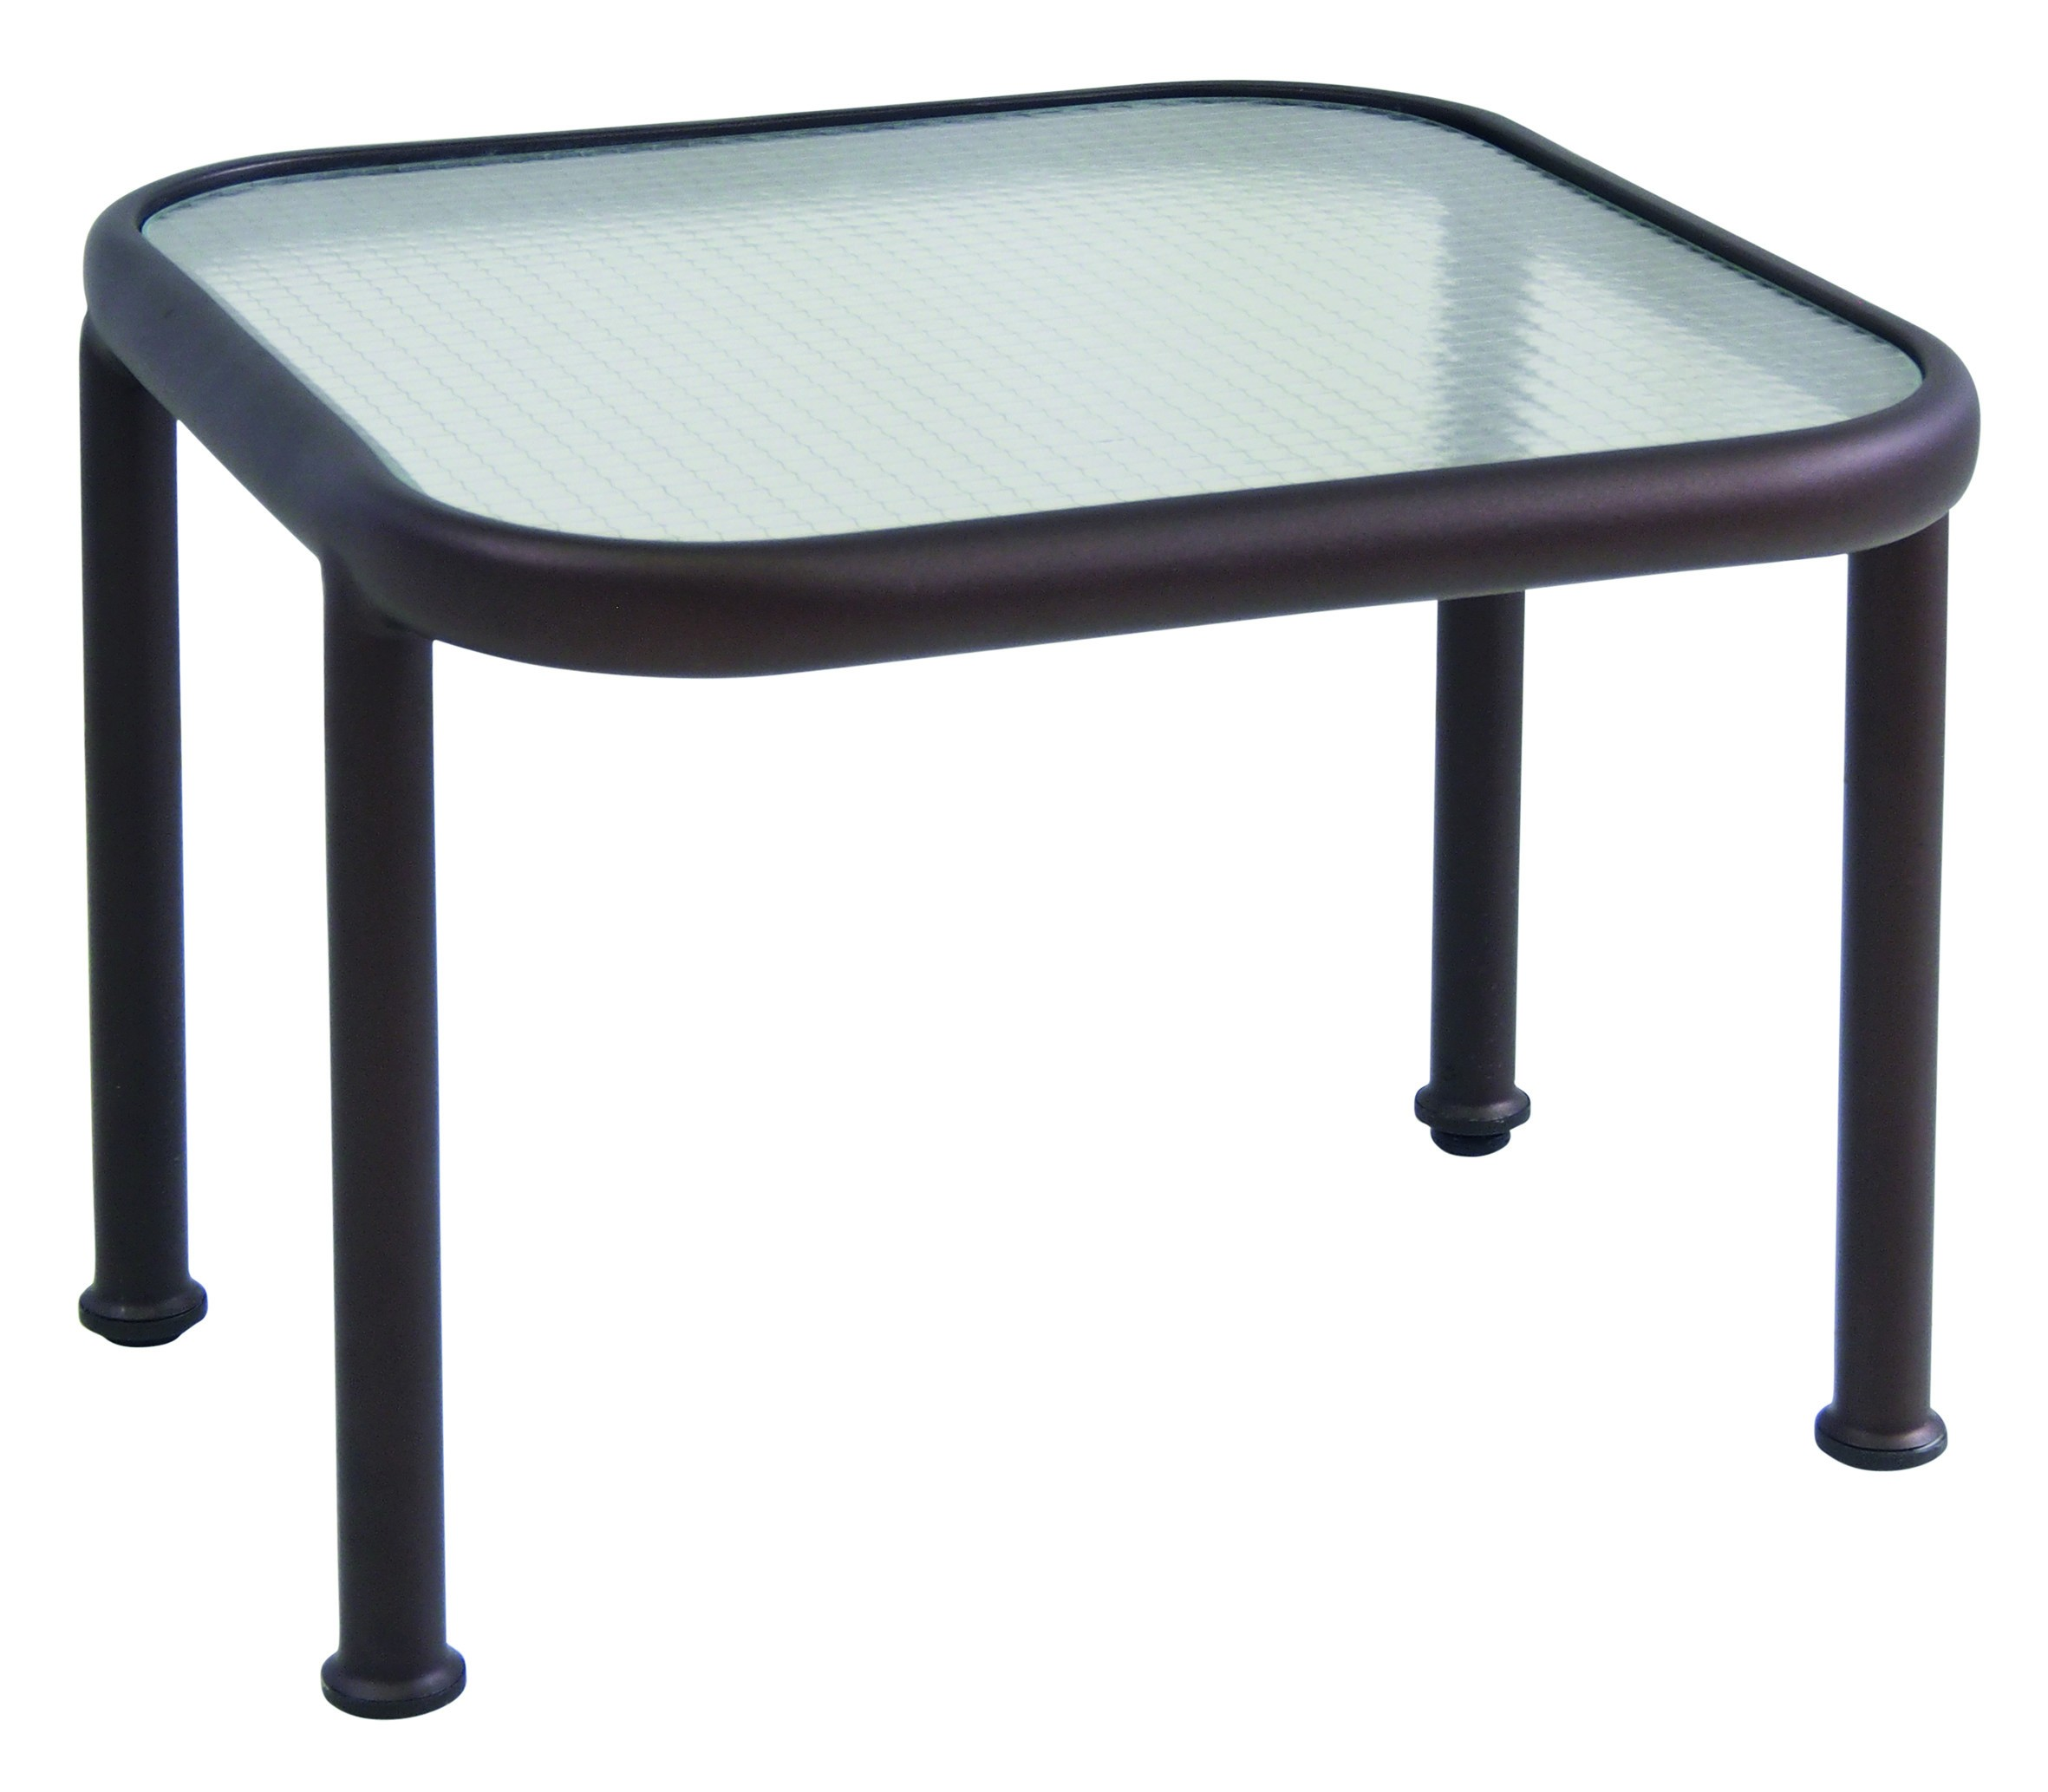 Table Basse En Verre Carree Dock De Emu